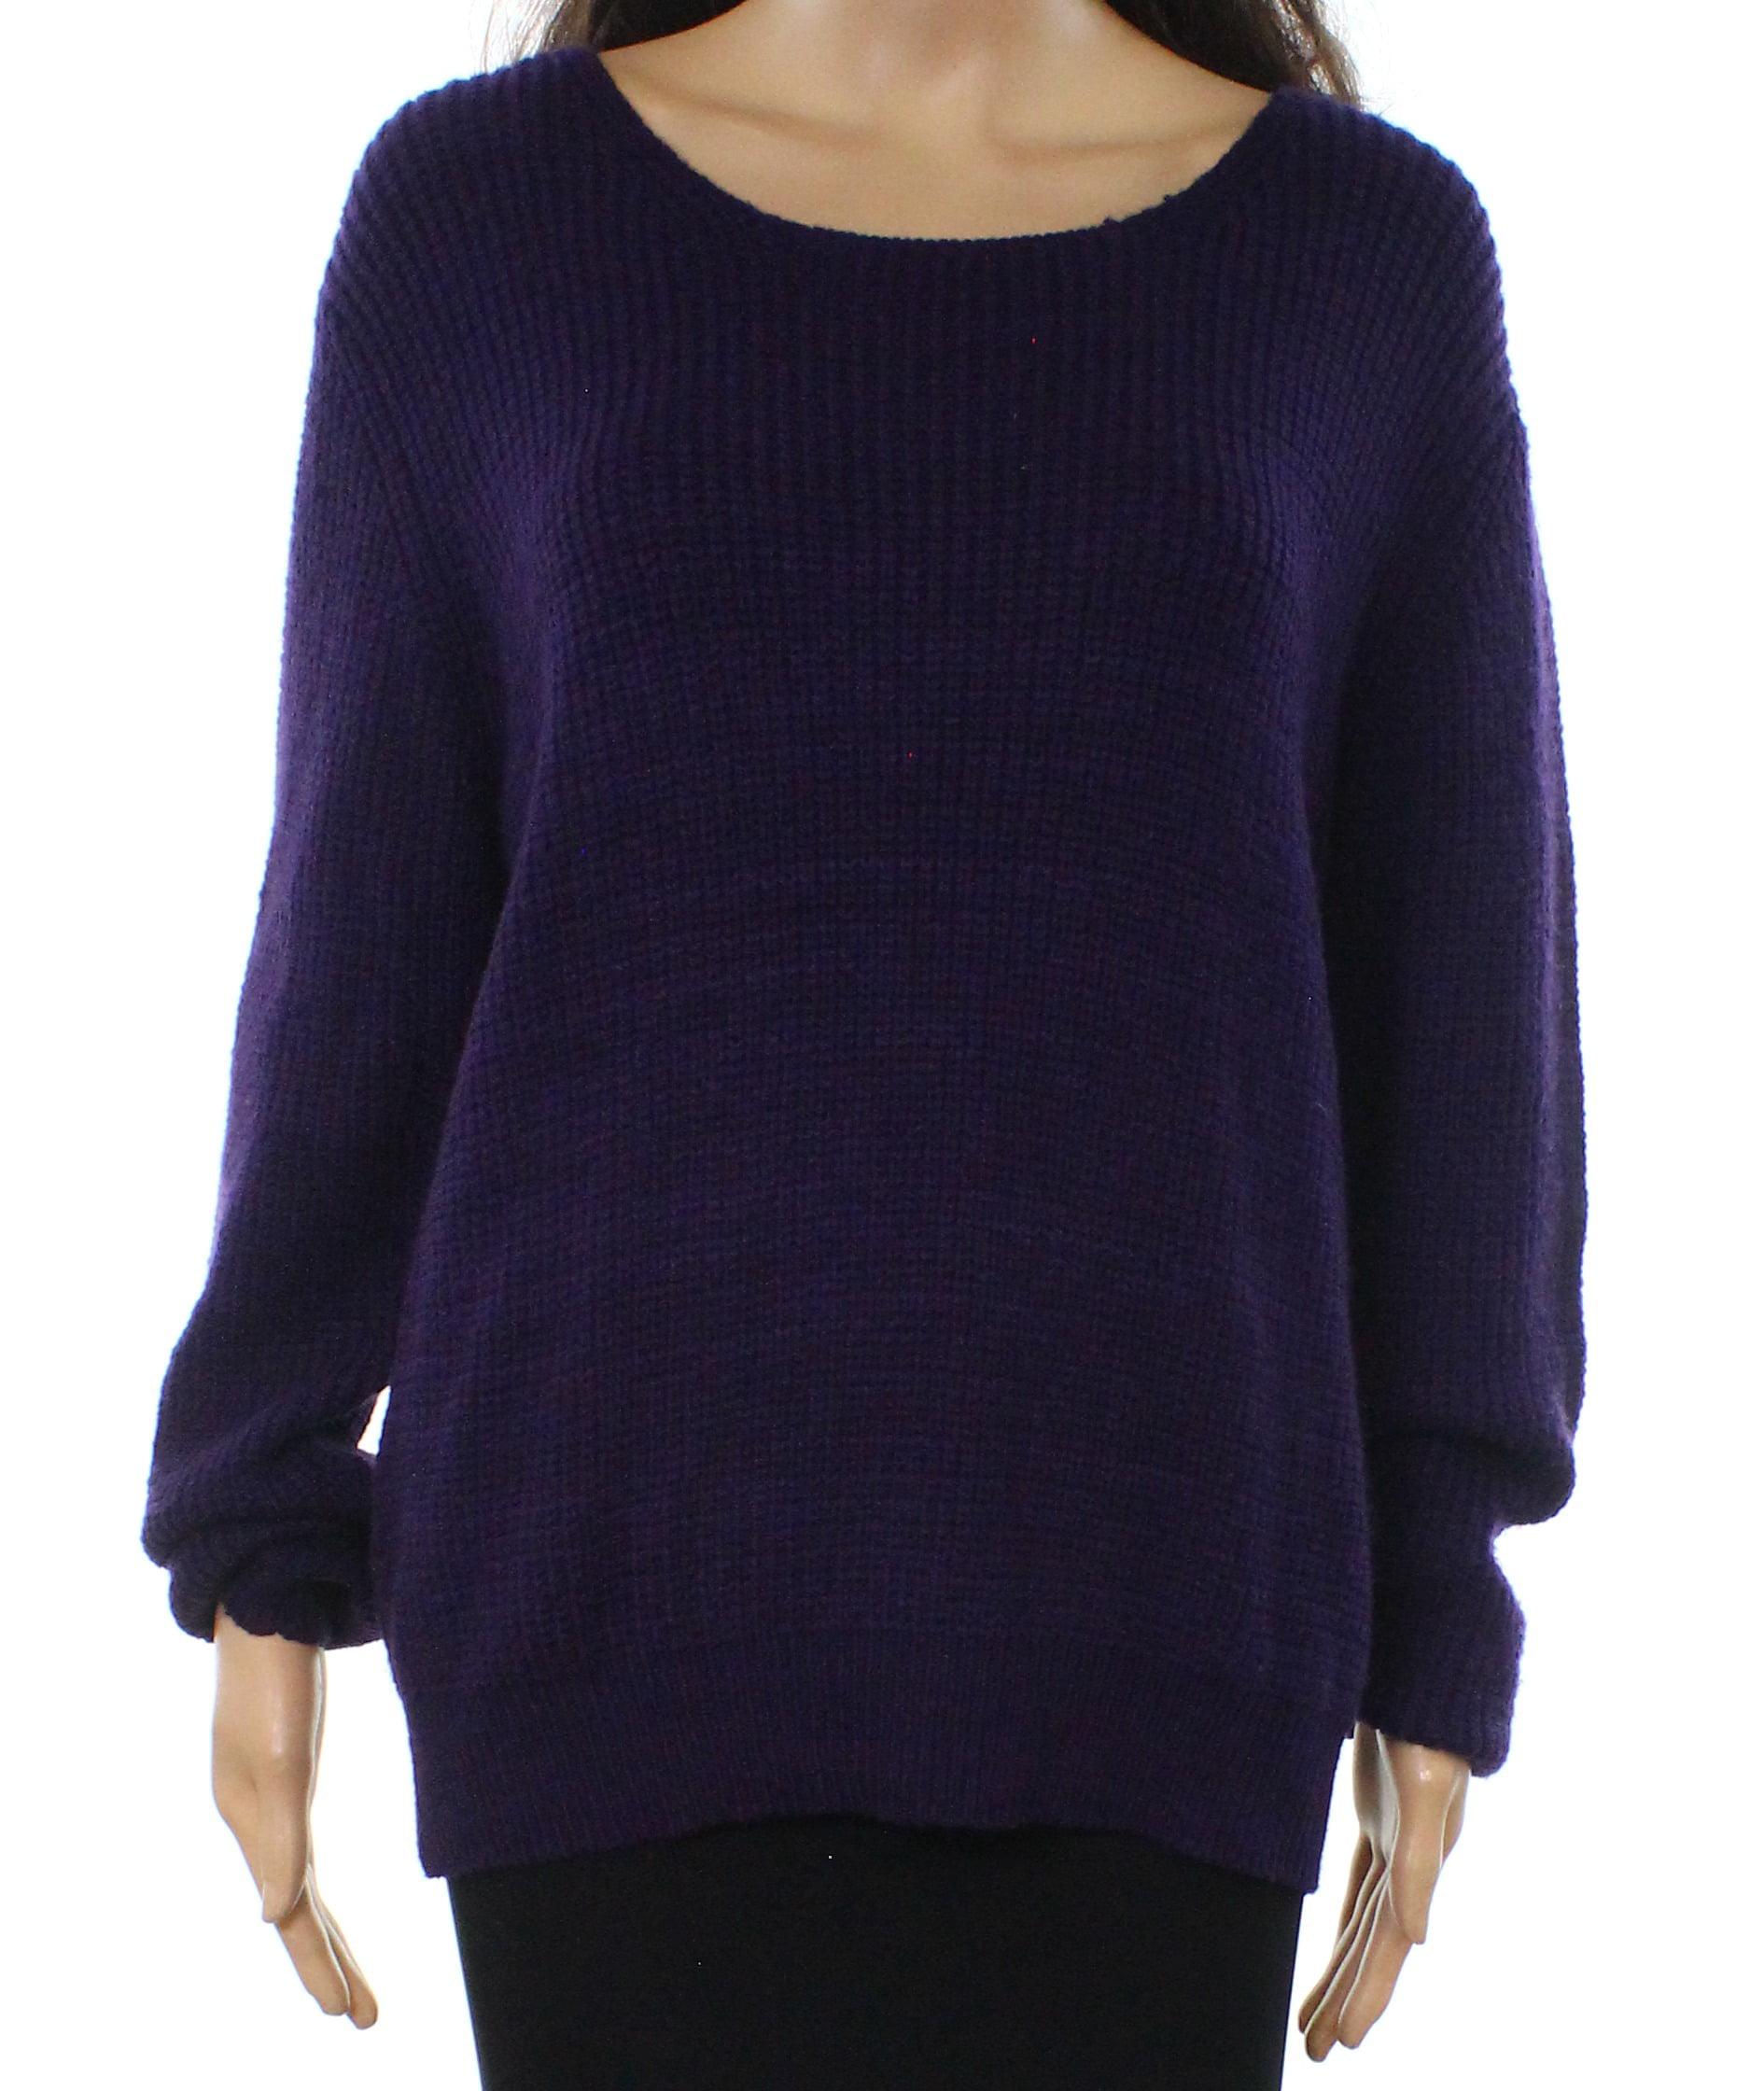 Autumn Cashmere Womens Scoop Neck Cable Knit Sweater Purple Cashmere Size XS | eBay